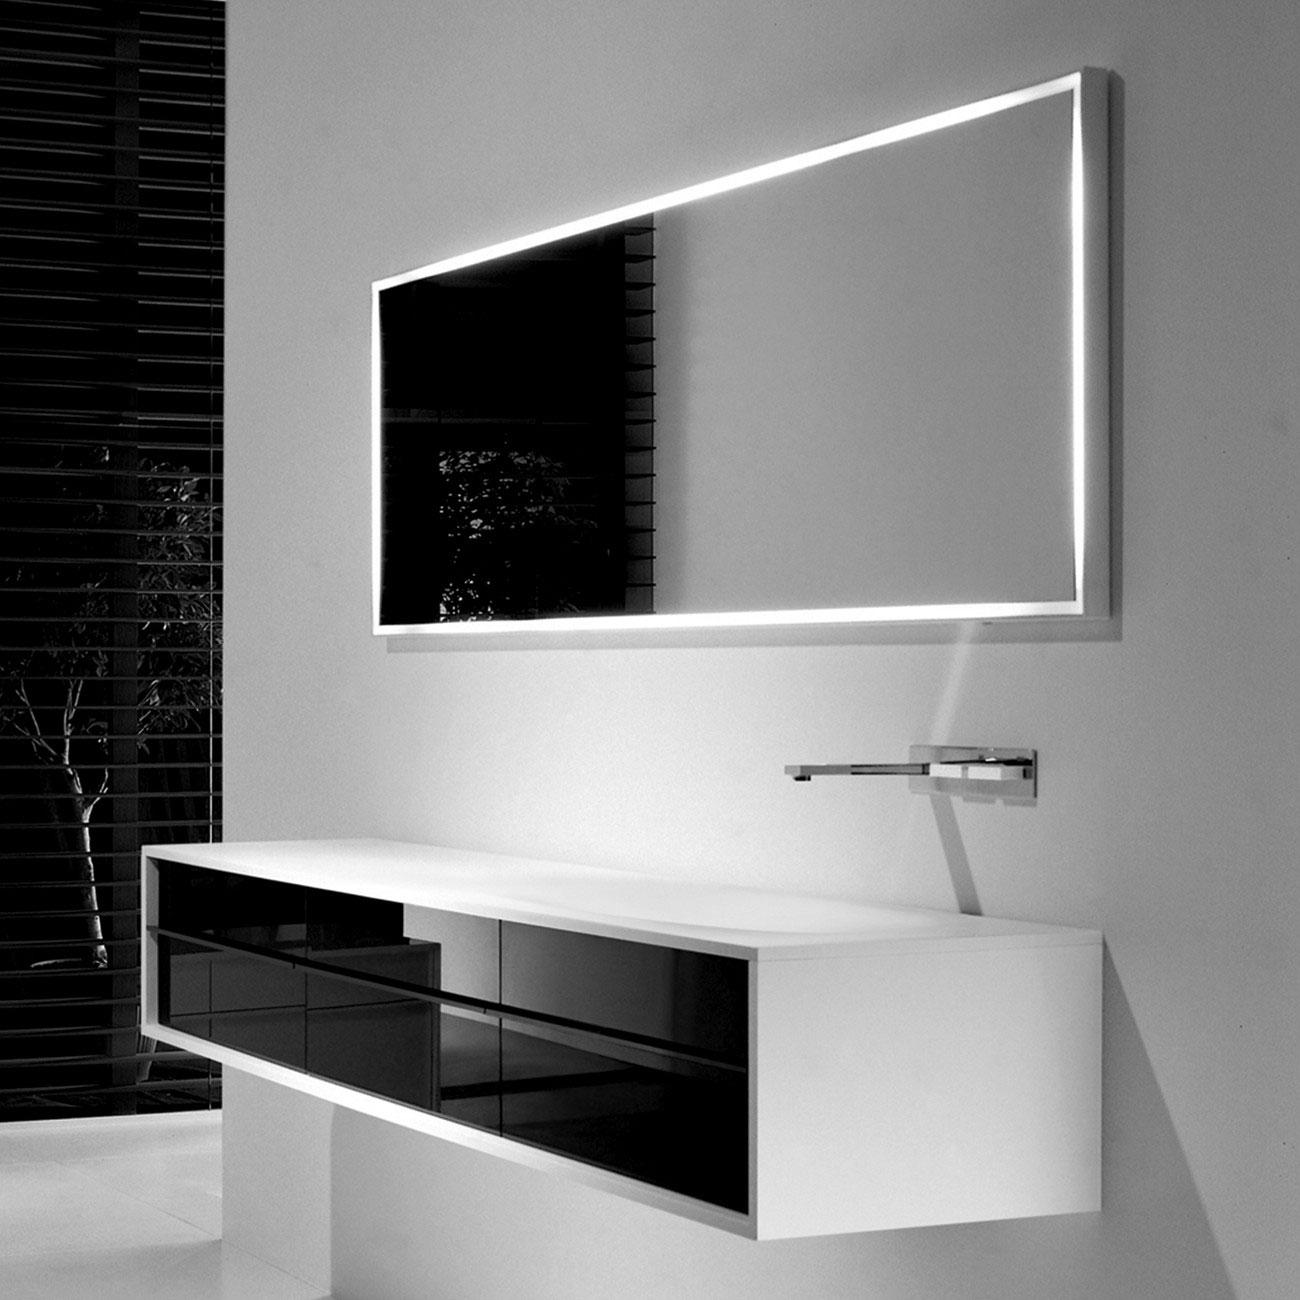 Meubles de salle de bains aix en provence mobilier for Moab salle de bain